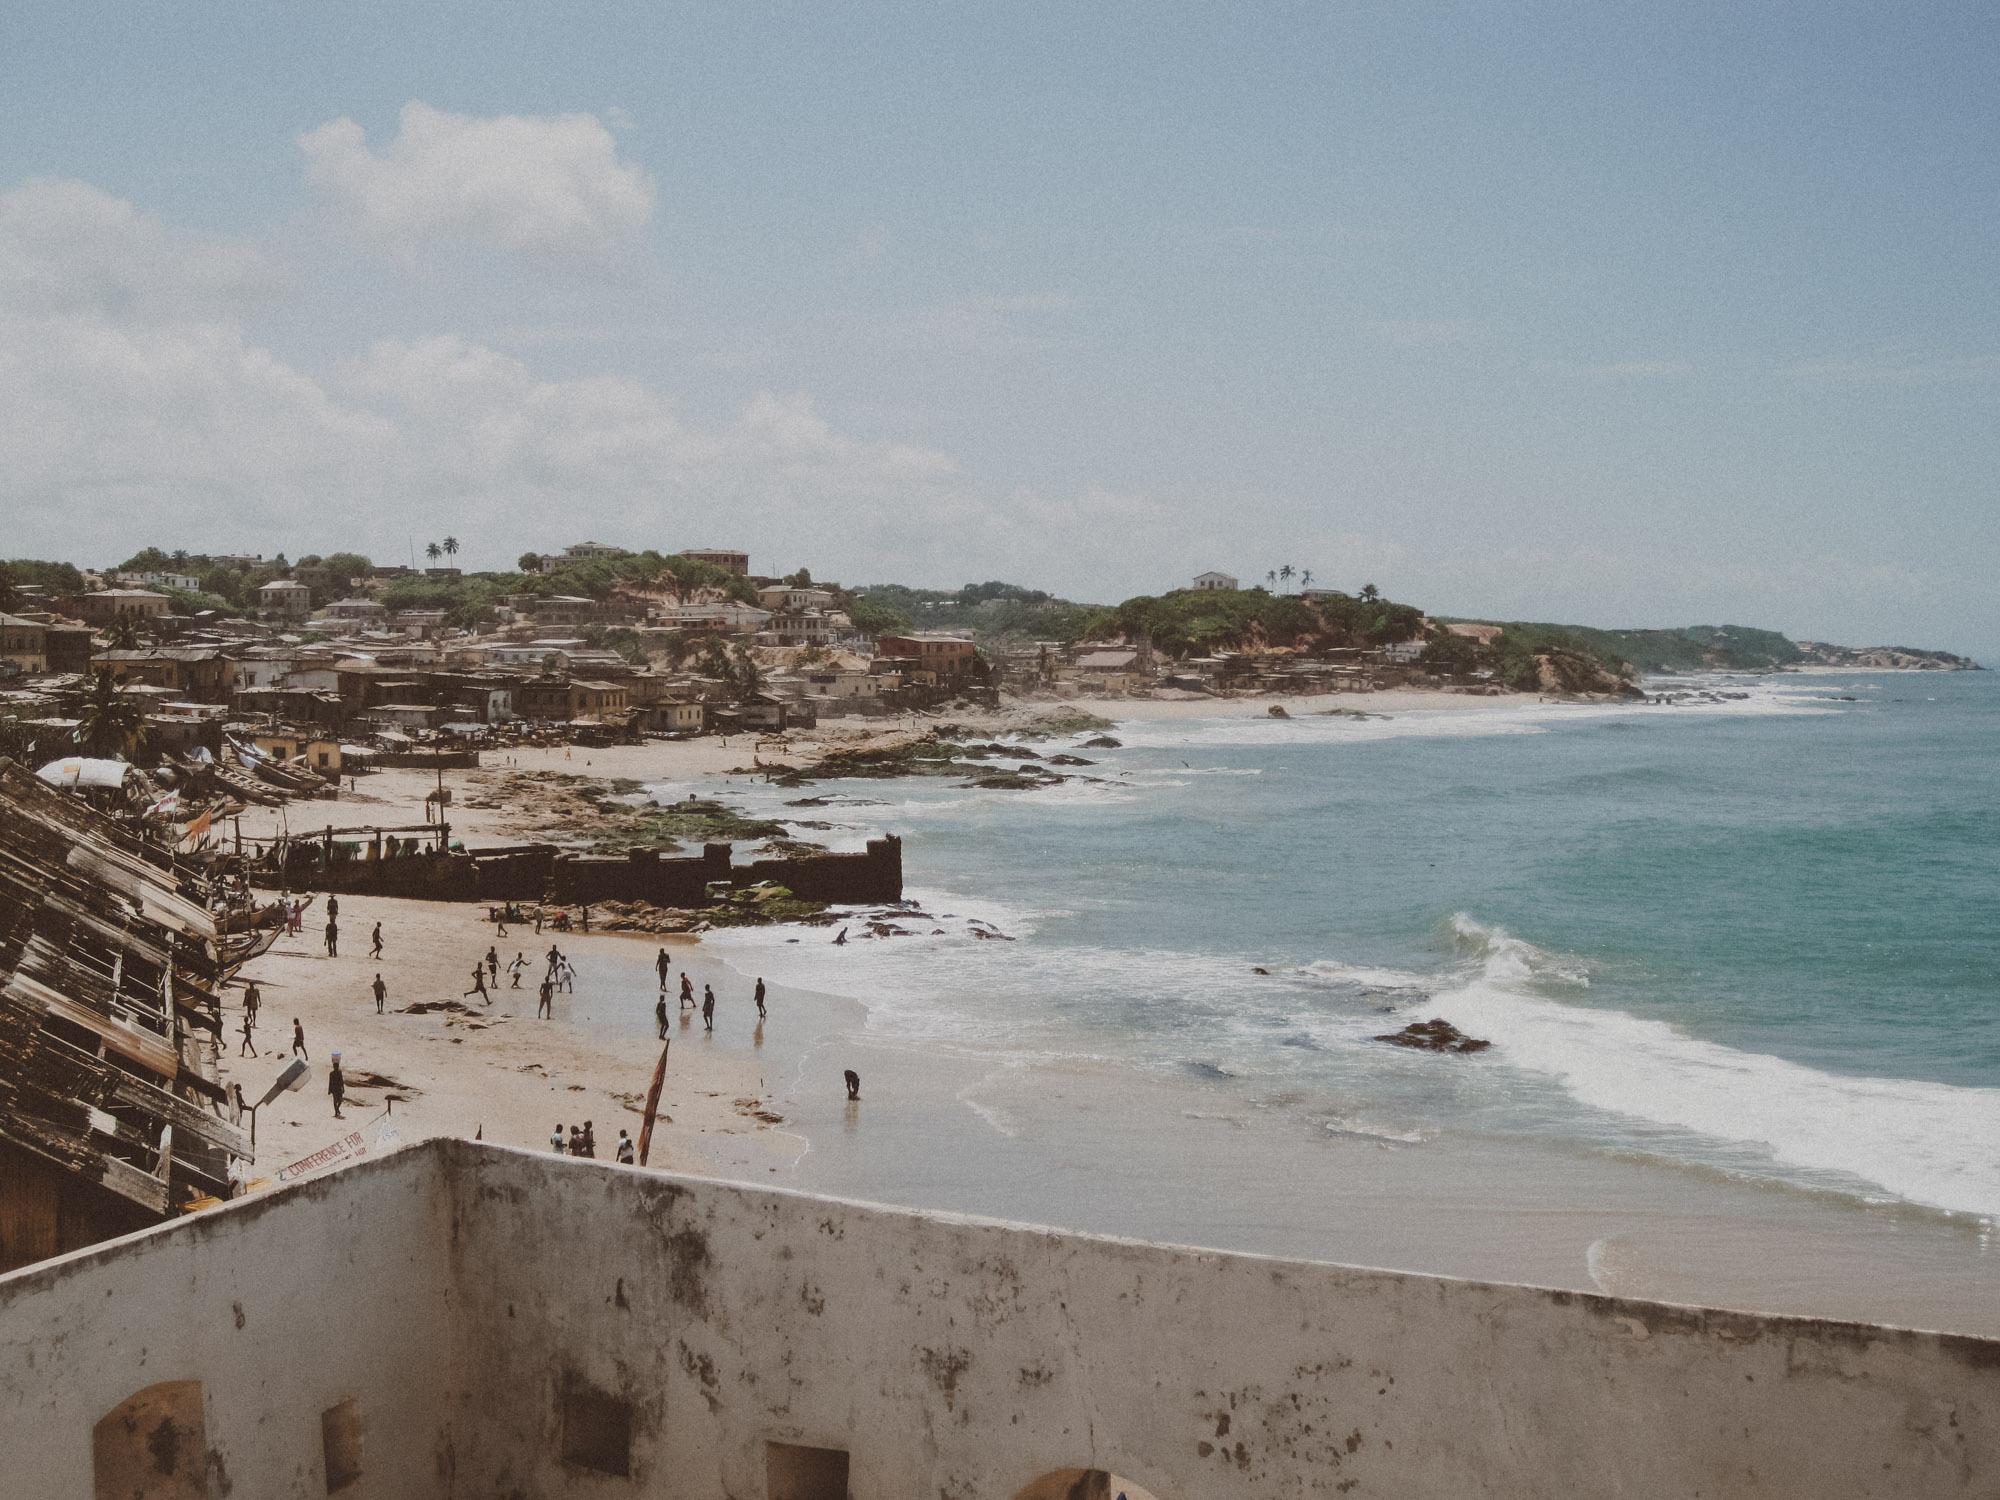 Cape Coast, Ghana | Photo by Caroline Taft,  The Brazen Gourmand